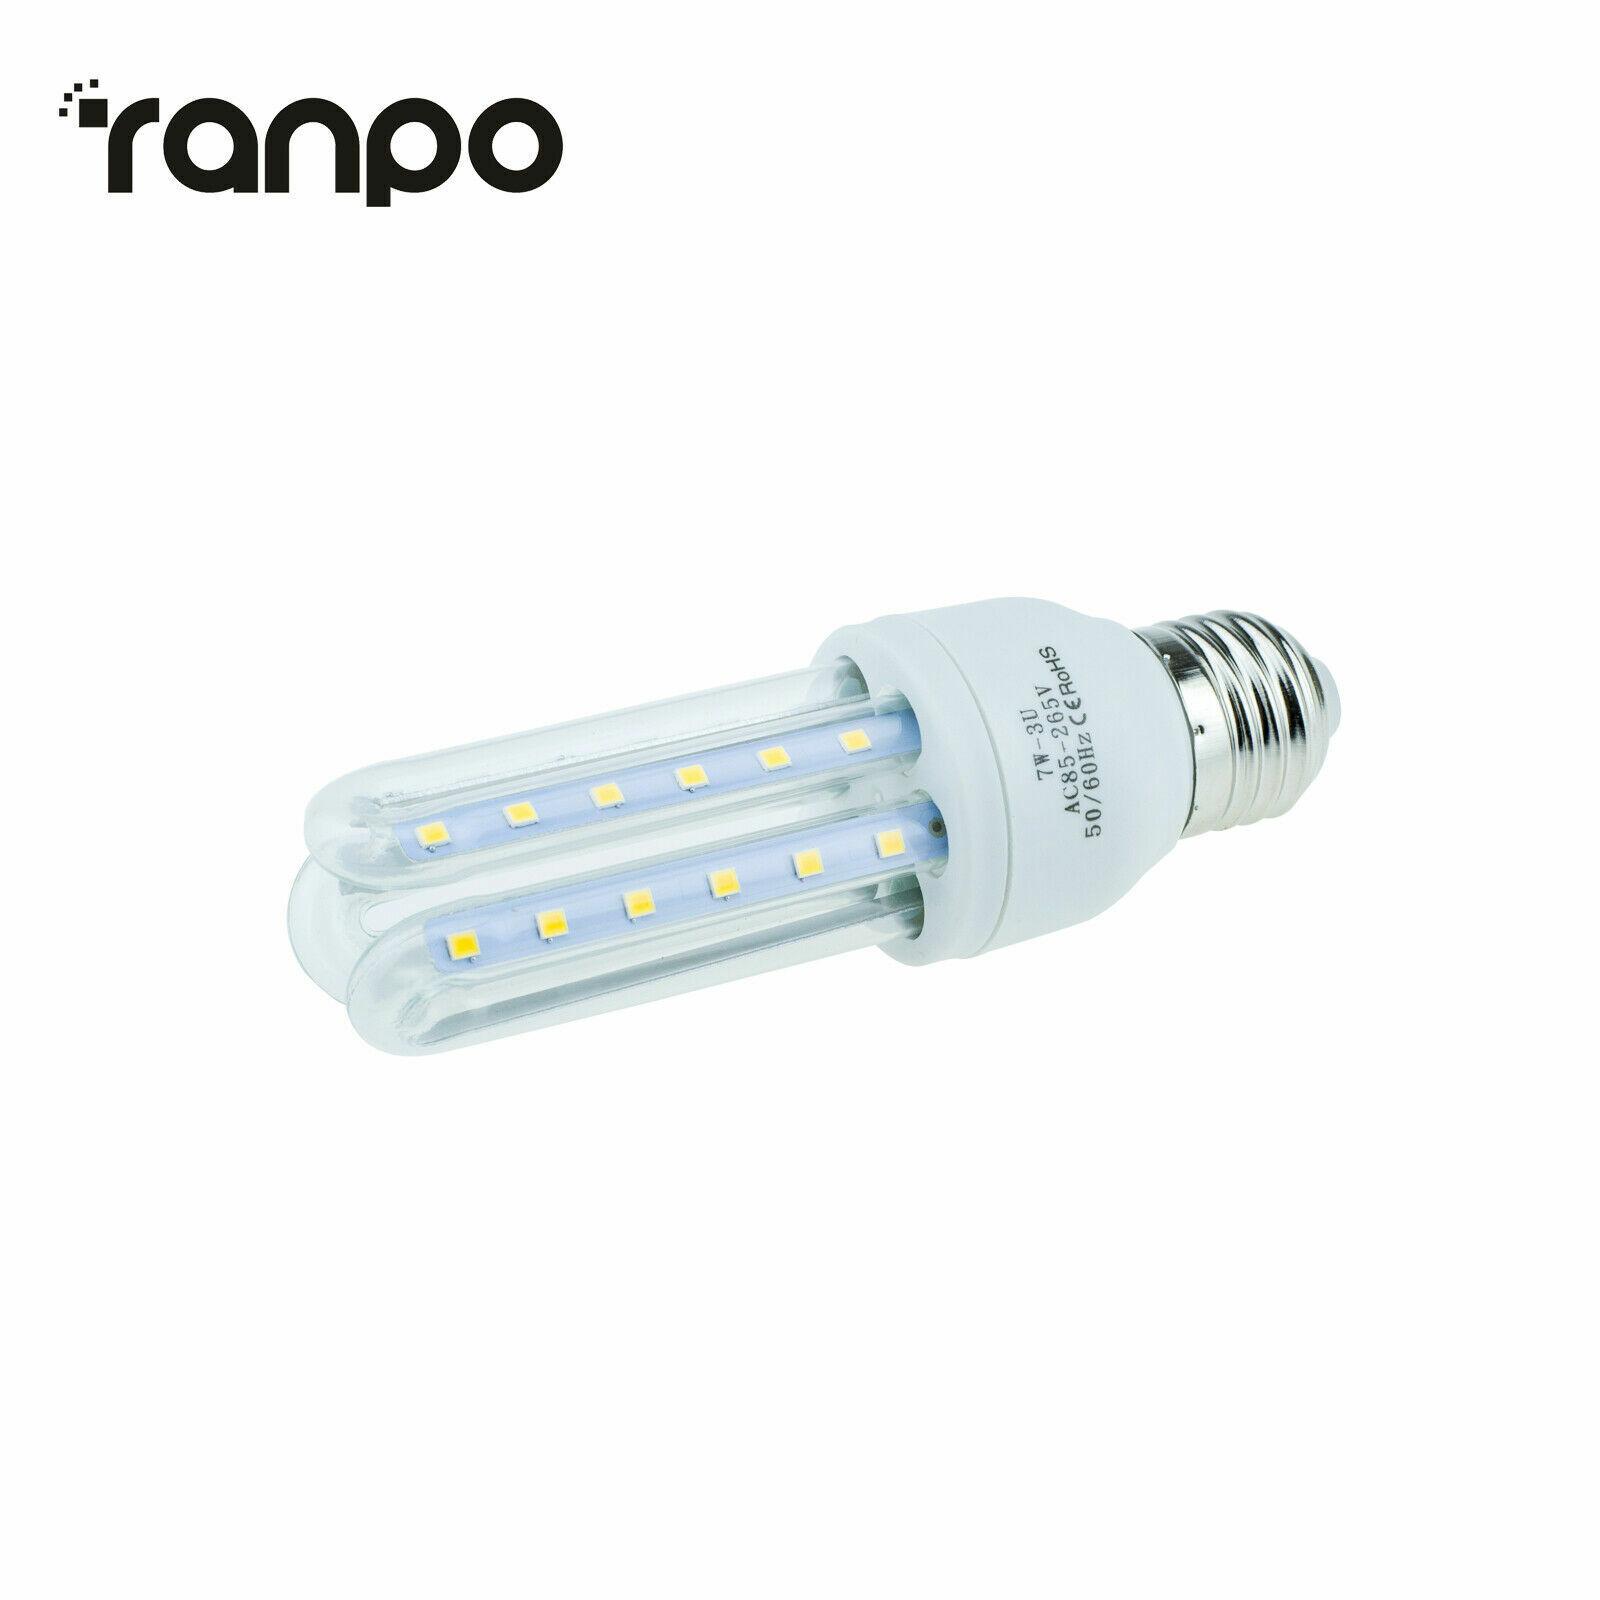 E27 Energy Saving LED Corn Bulb 3W 5W 7W 9W 12W 2835 SMD Light White Home Lamp S